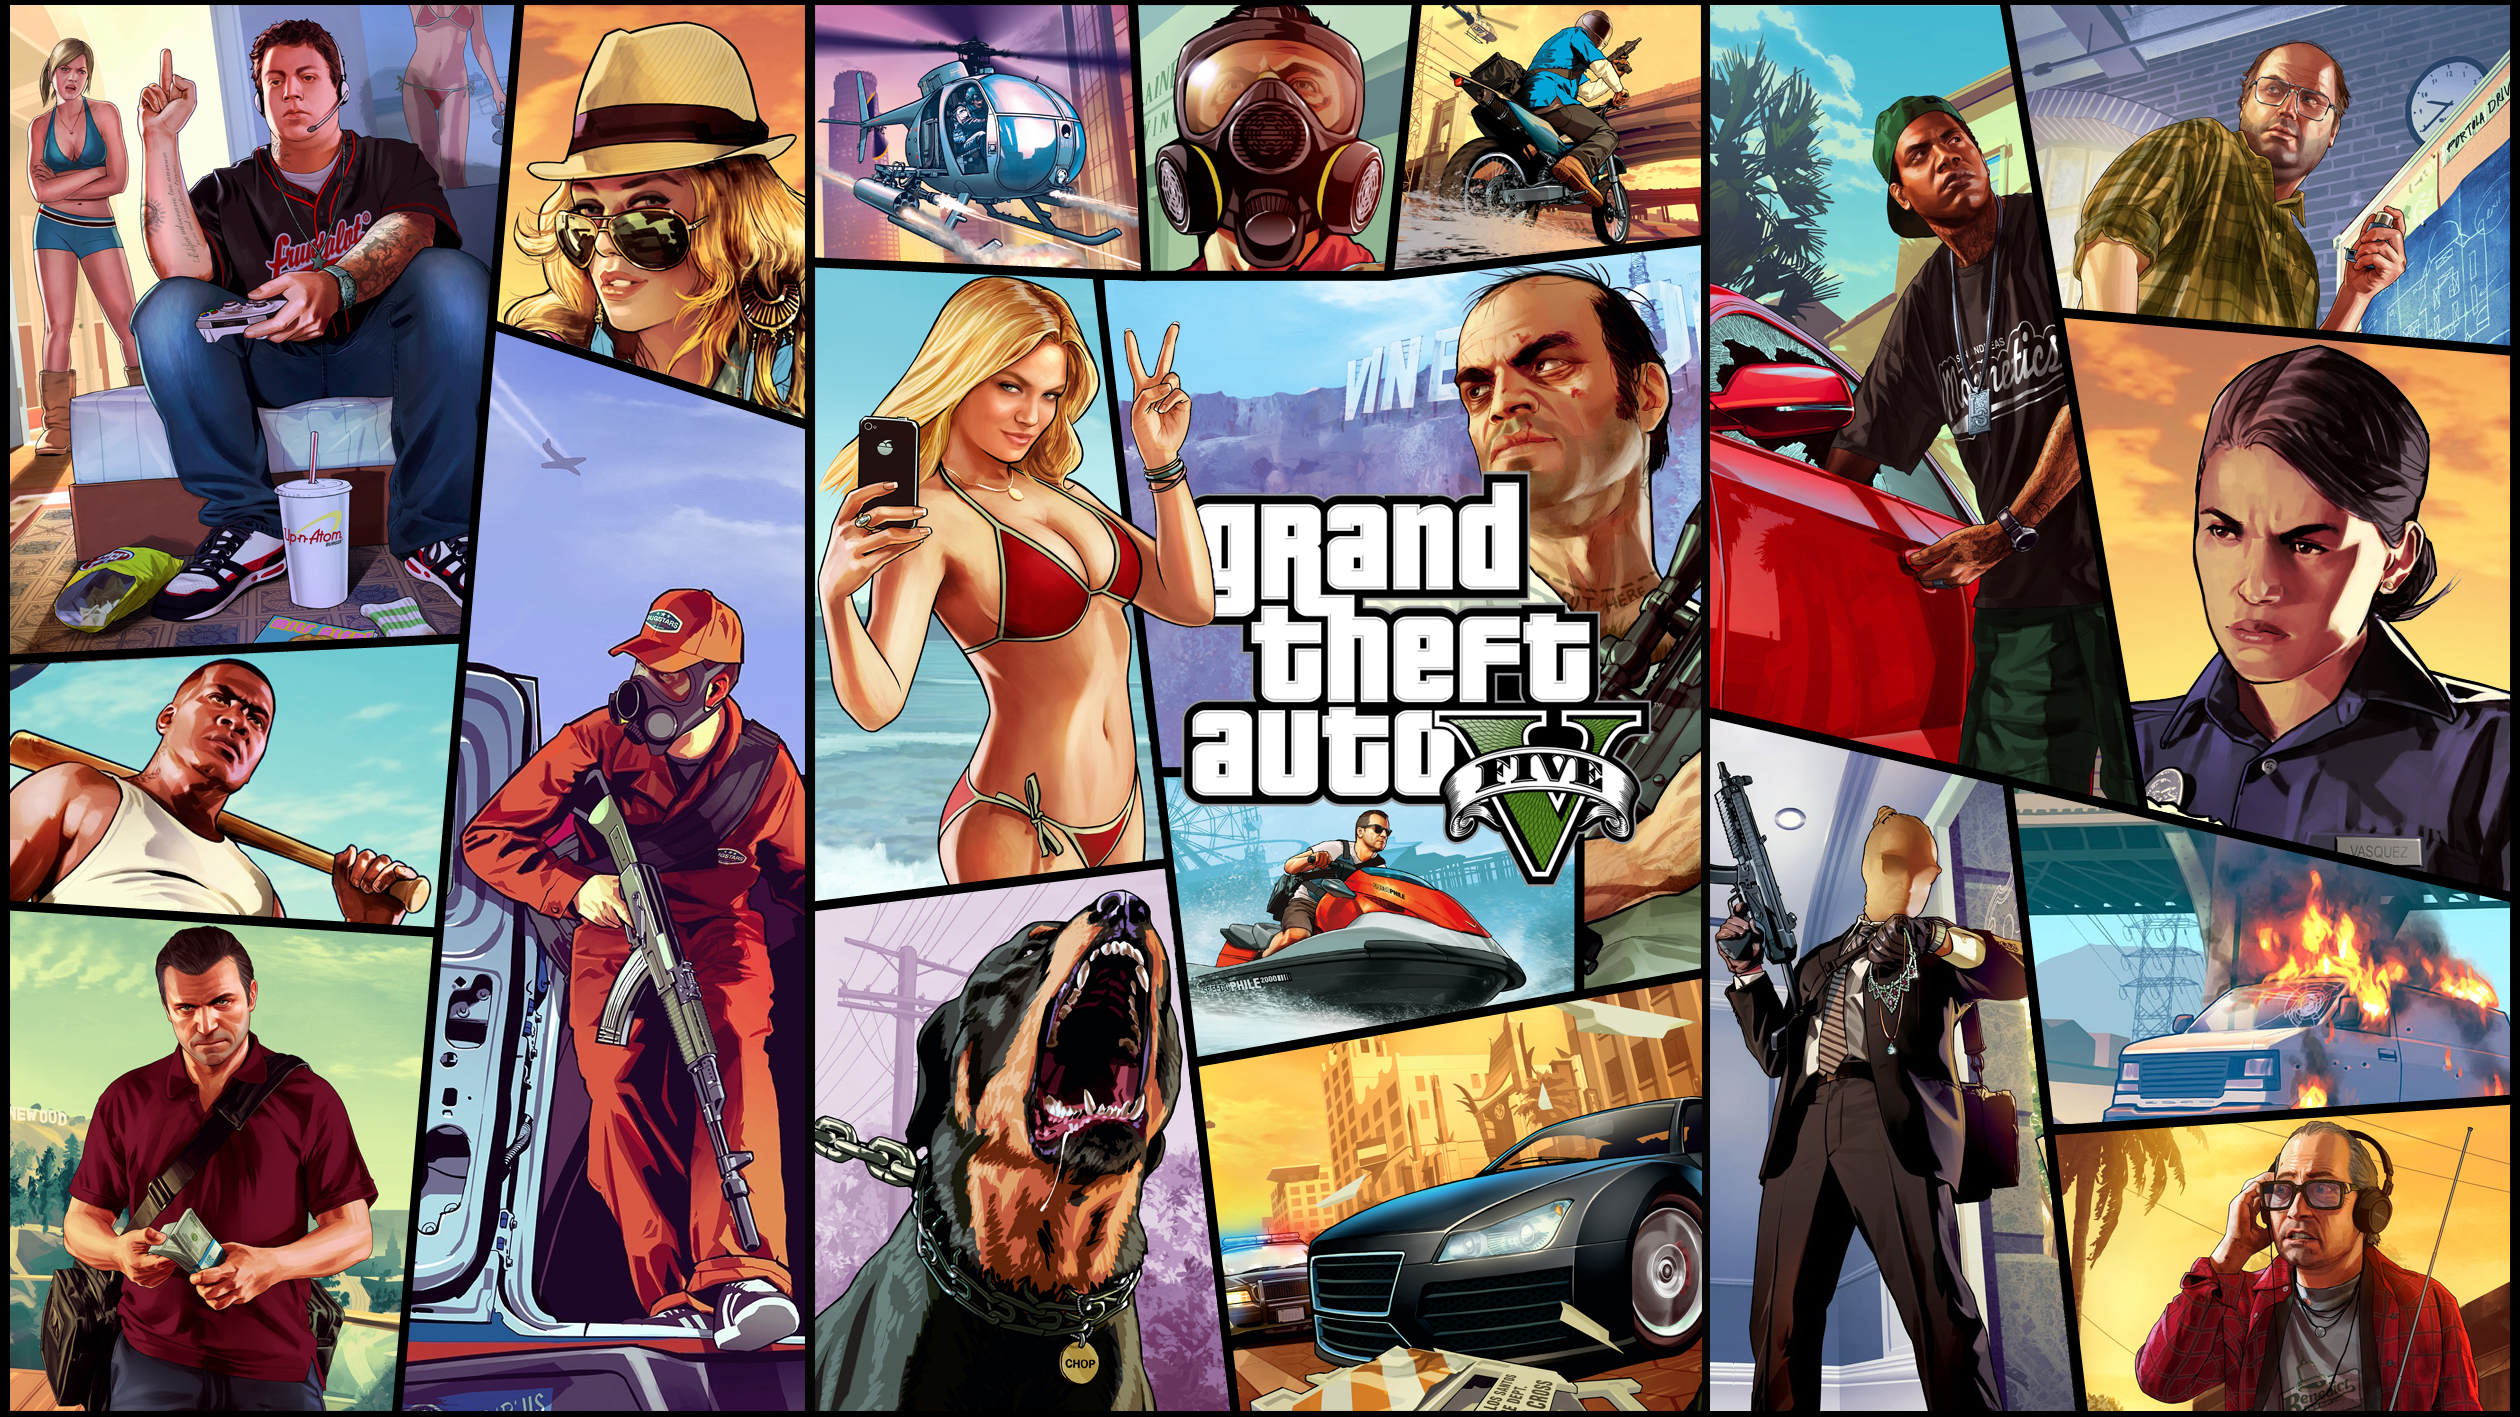 Grand Theft Auto V Wallpaper gta 5 Franklin Michael Trevor Ron 2520x1417